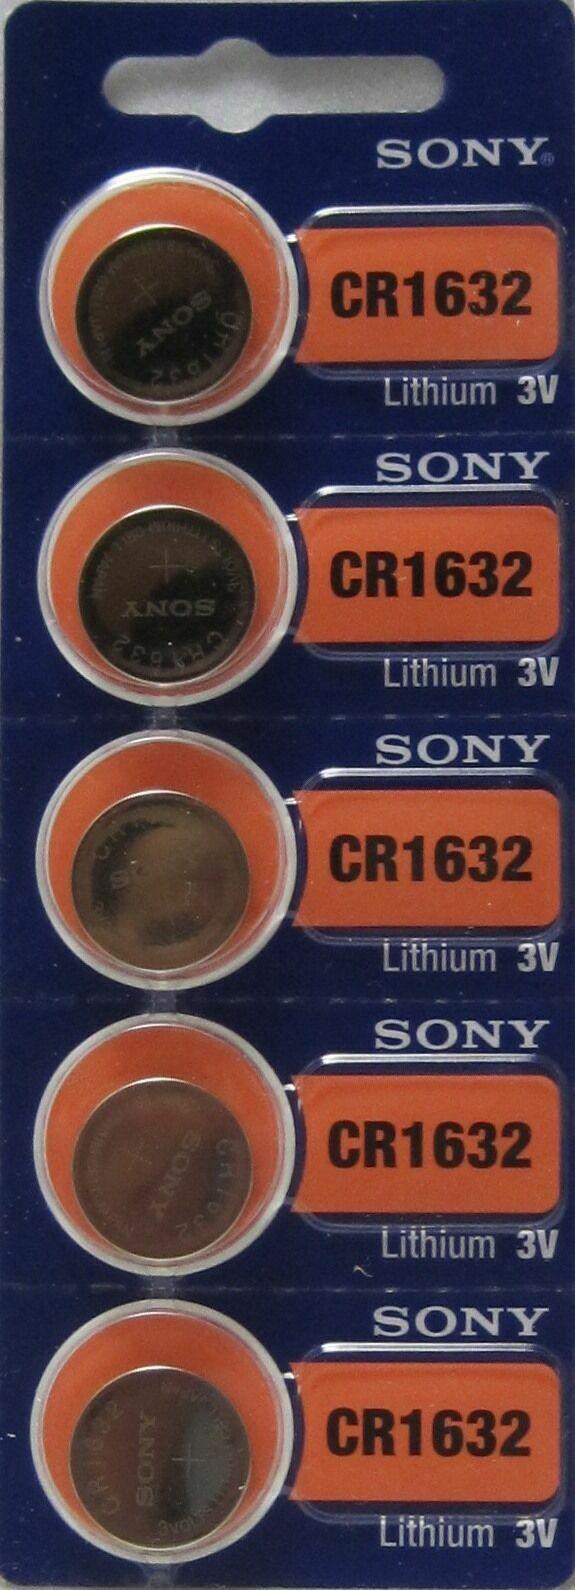 2 pieces CR1632 1632 DL1632 Sony Card 3V High Energy Lithium Battery